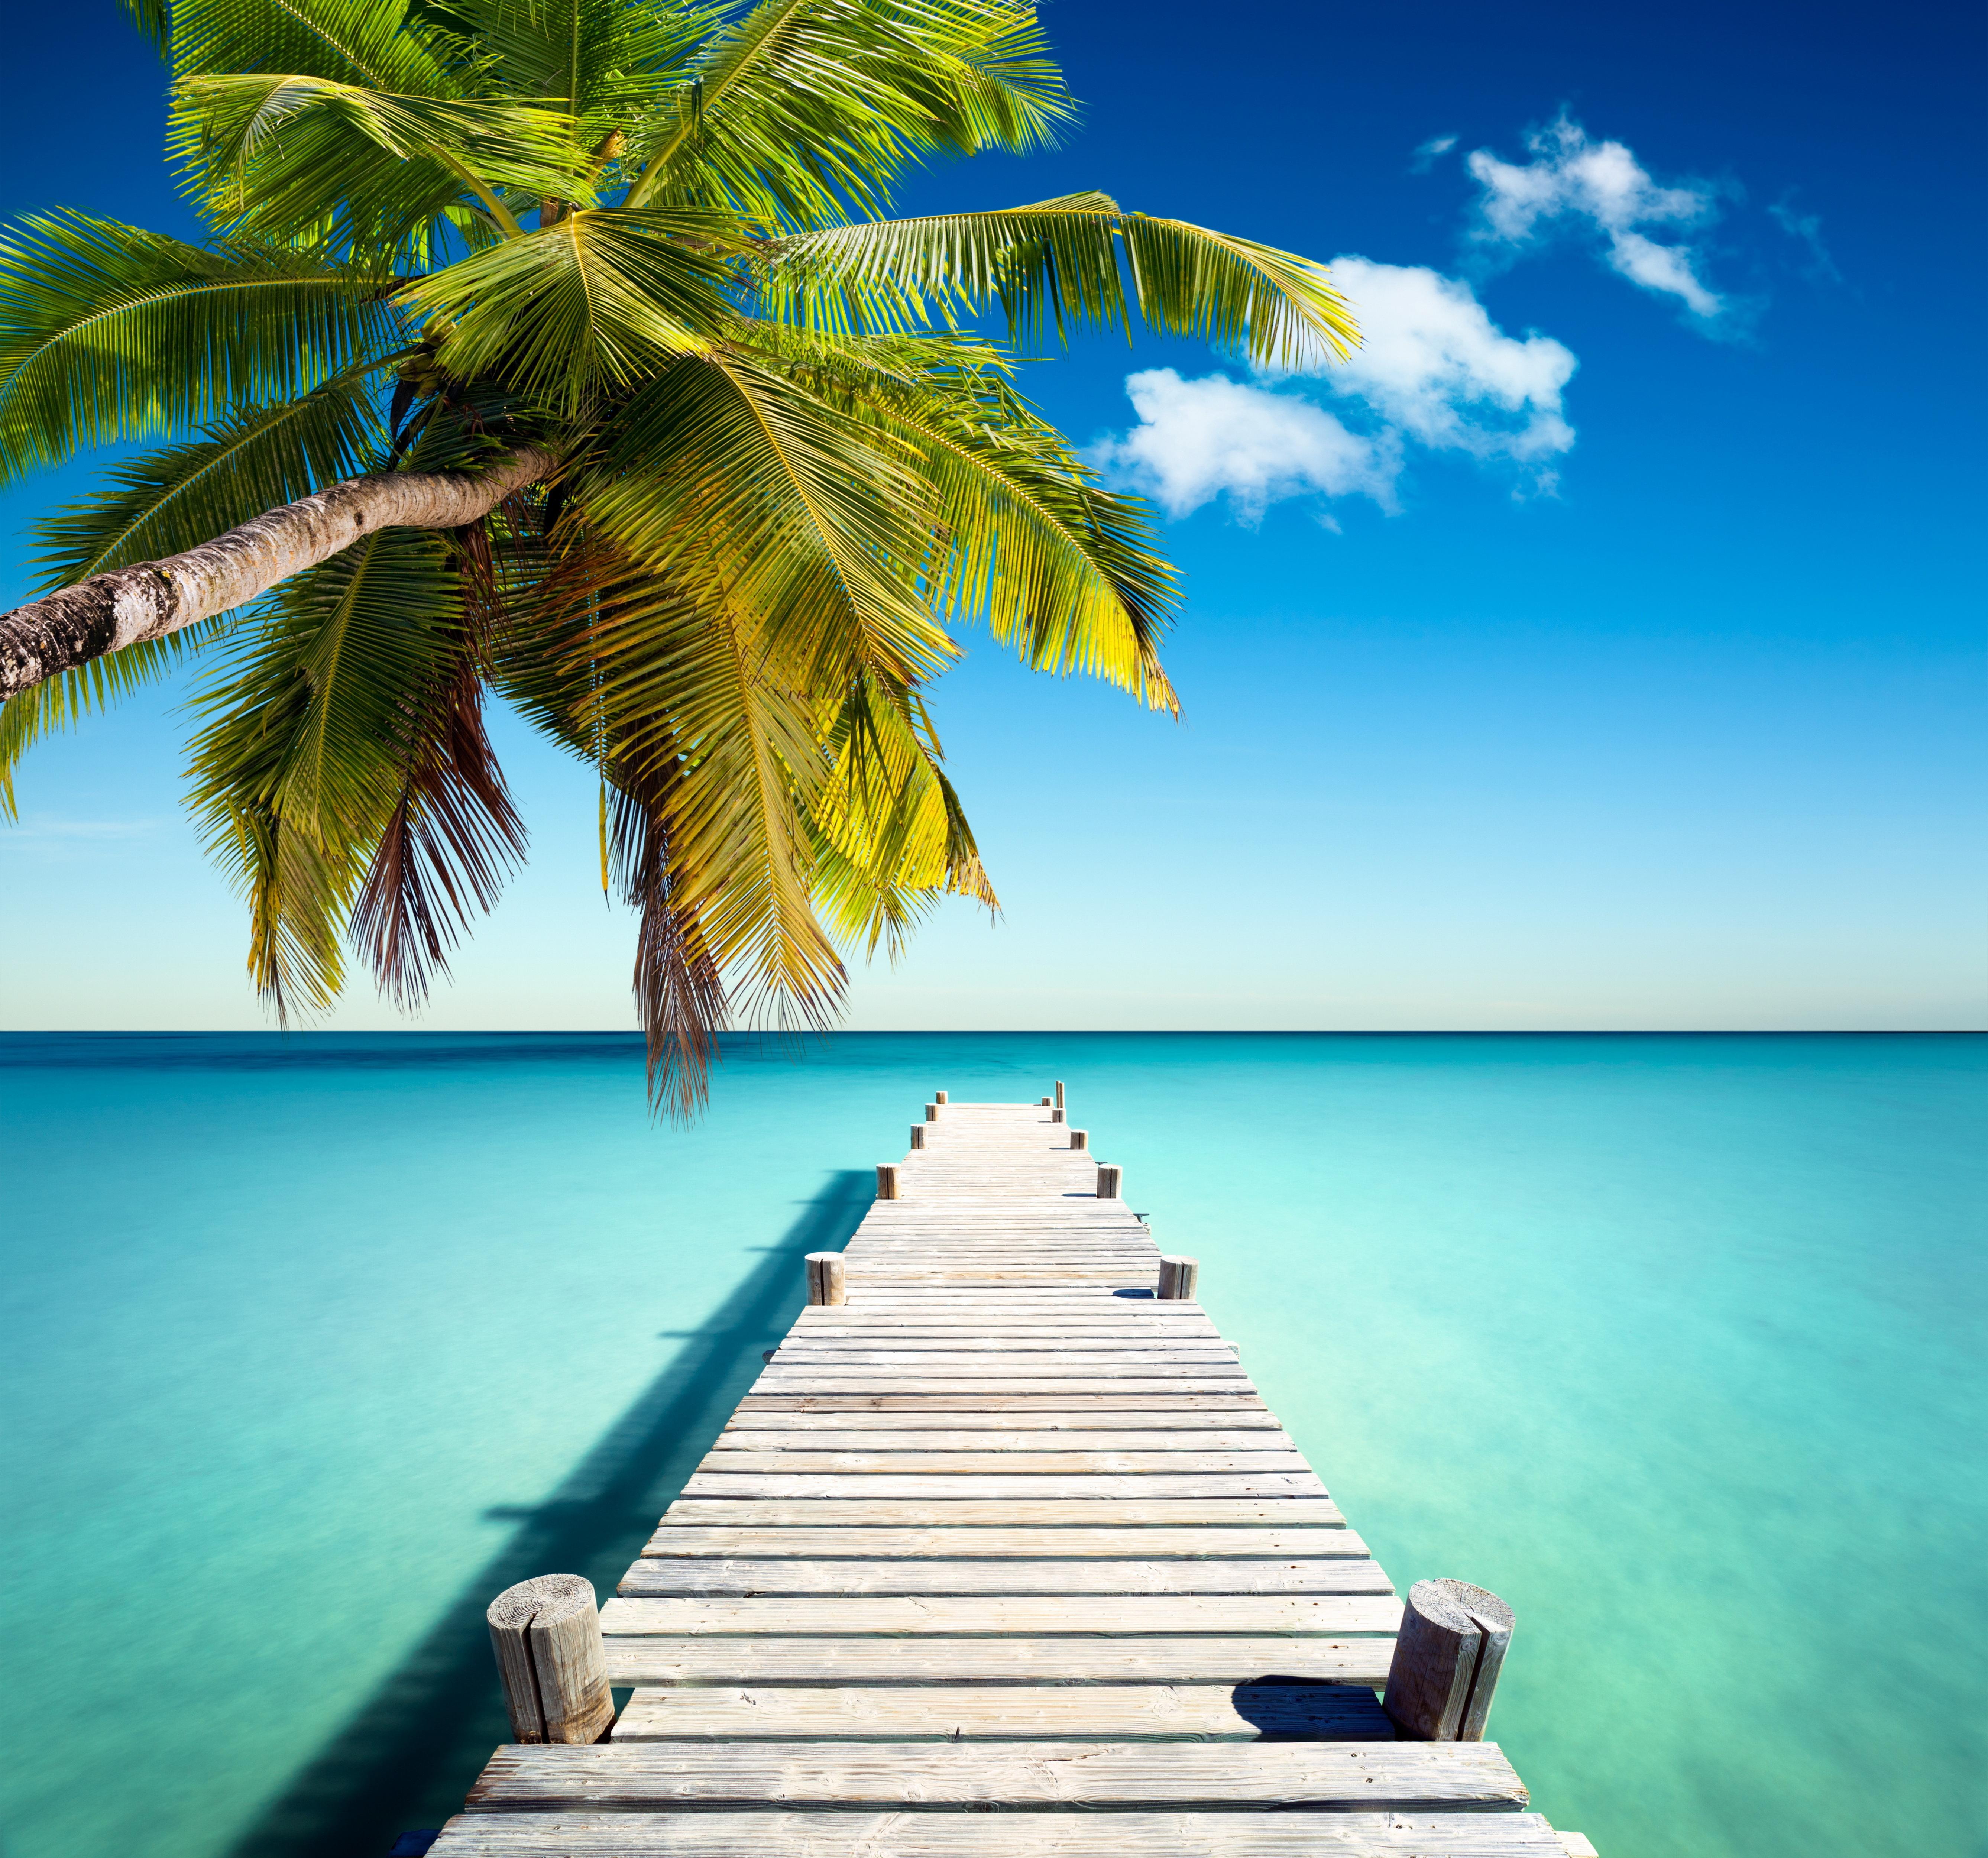 включает отпуск в раю картинка все неприятности